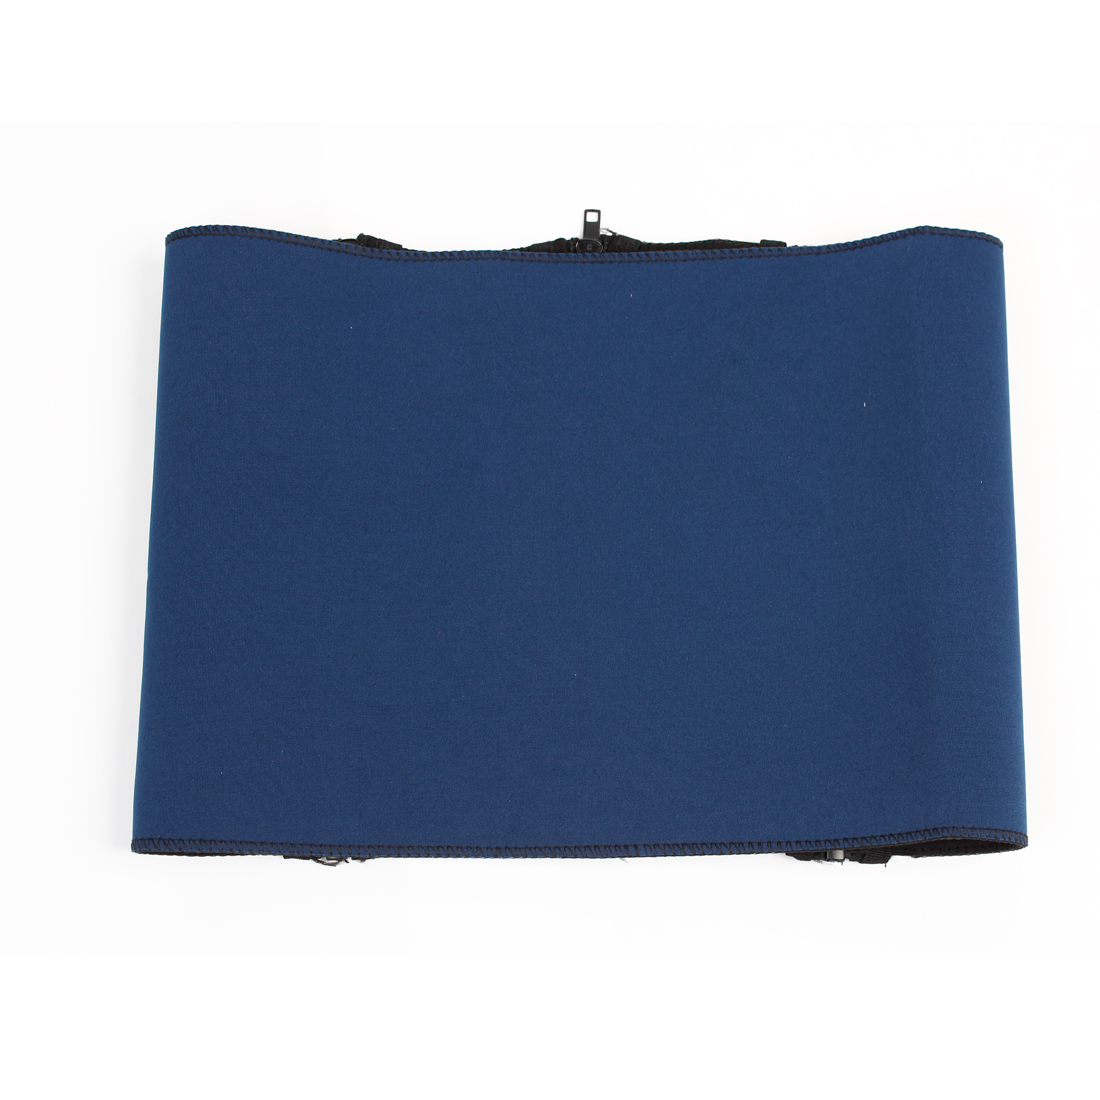 Unisex Blue Black Neoprene Zip Up Body Slimming Shaping Waist Support Wrap